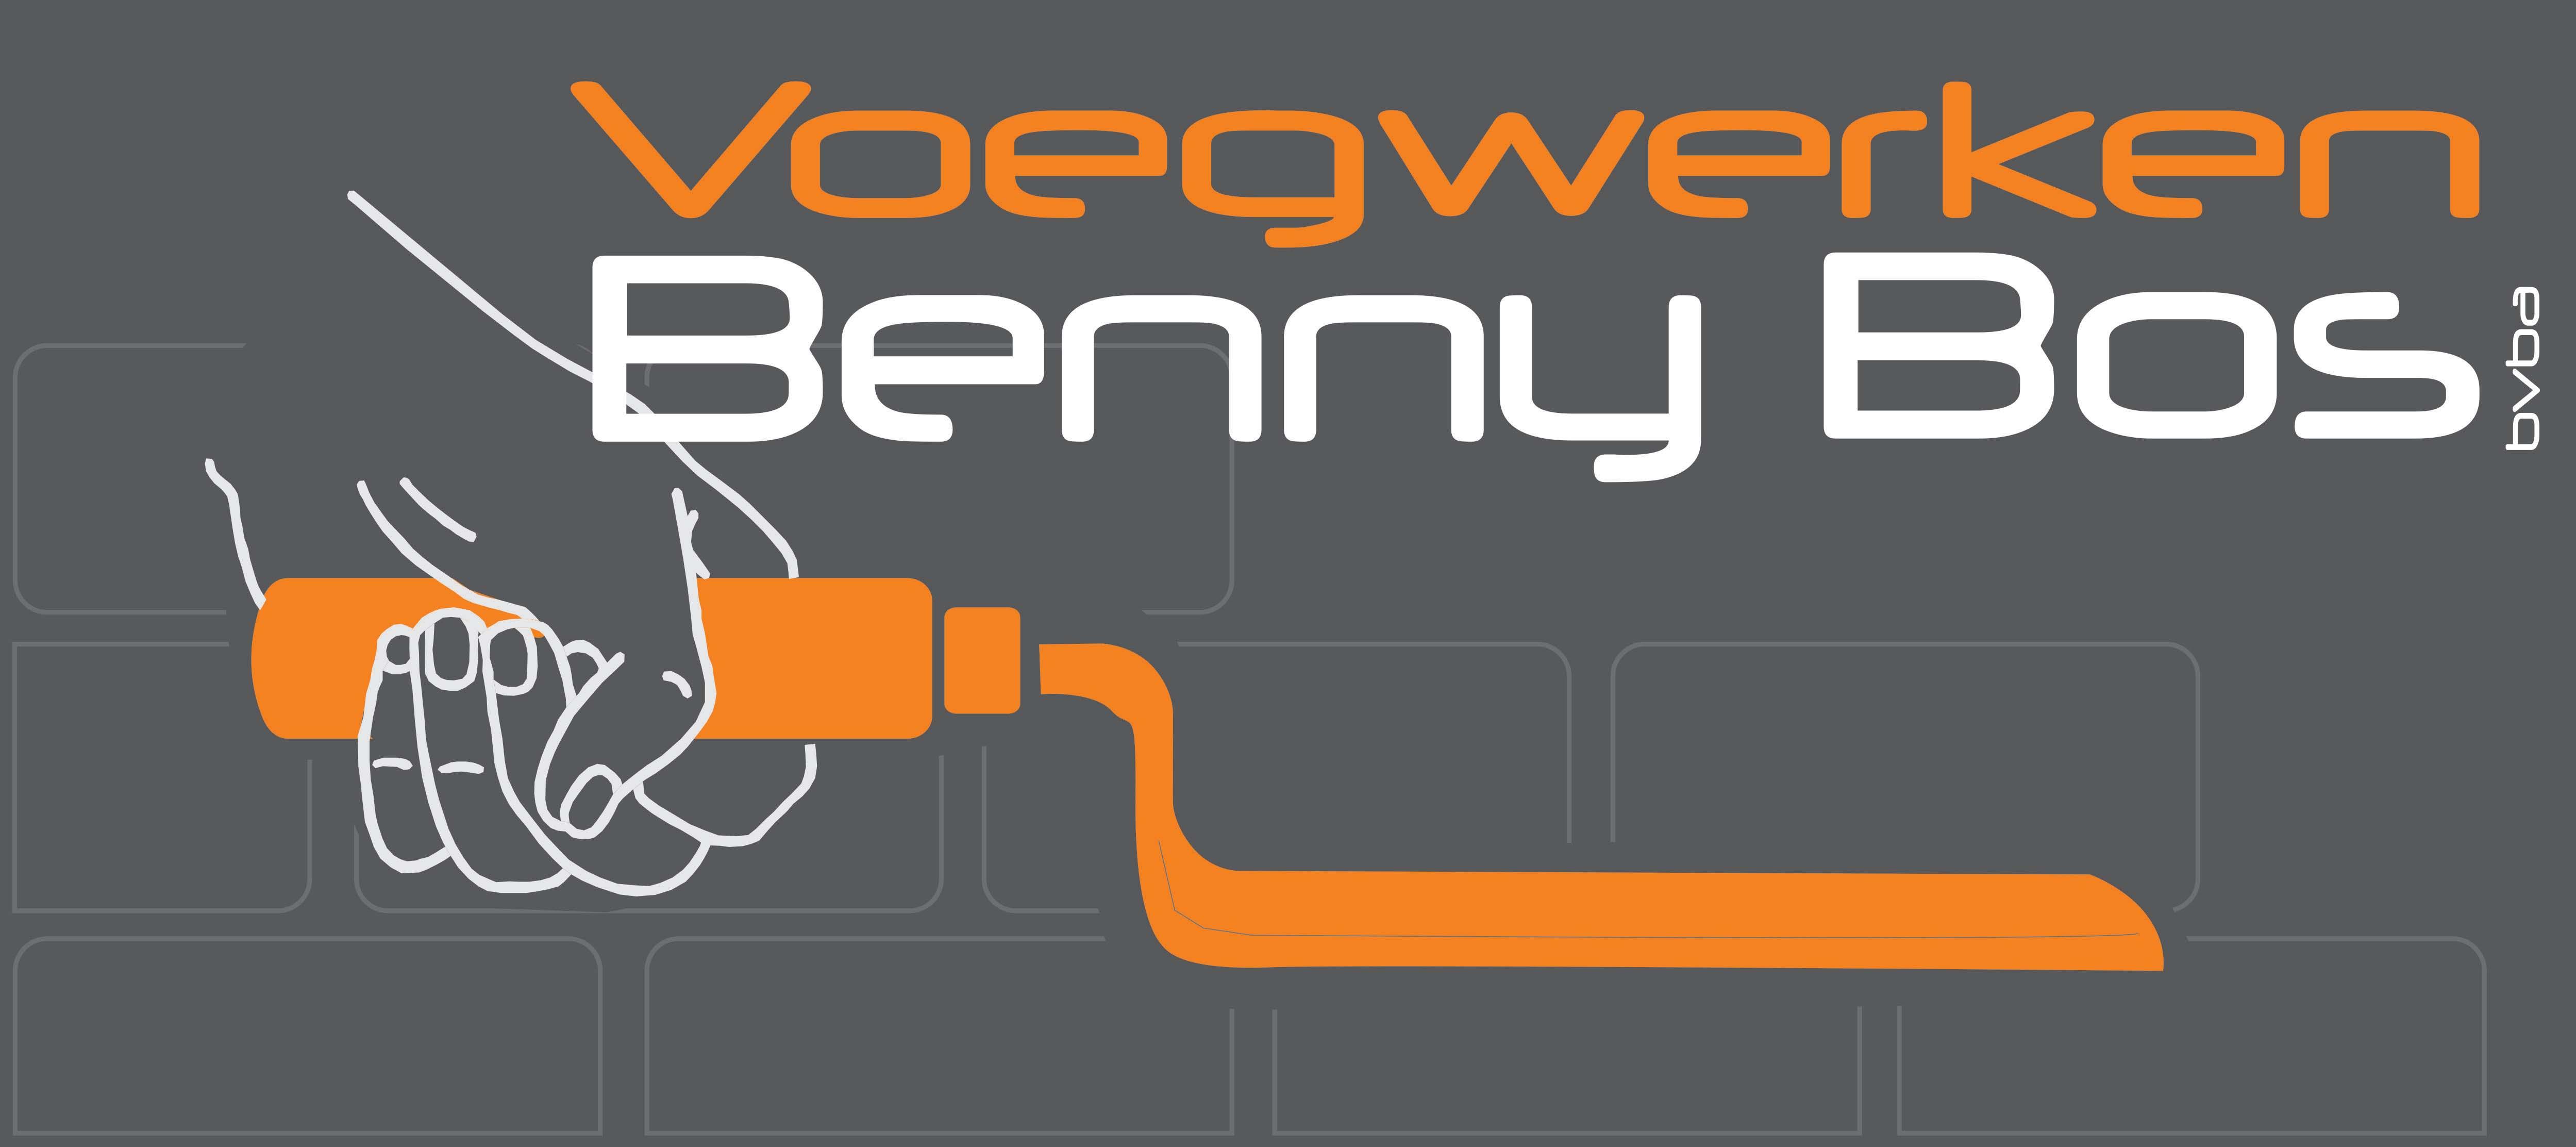 Benny Bos Voegwerken